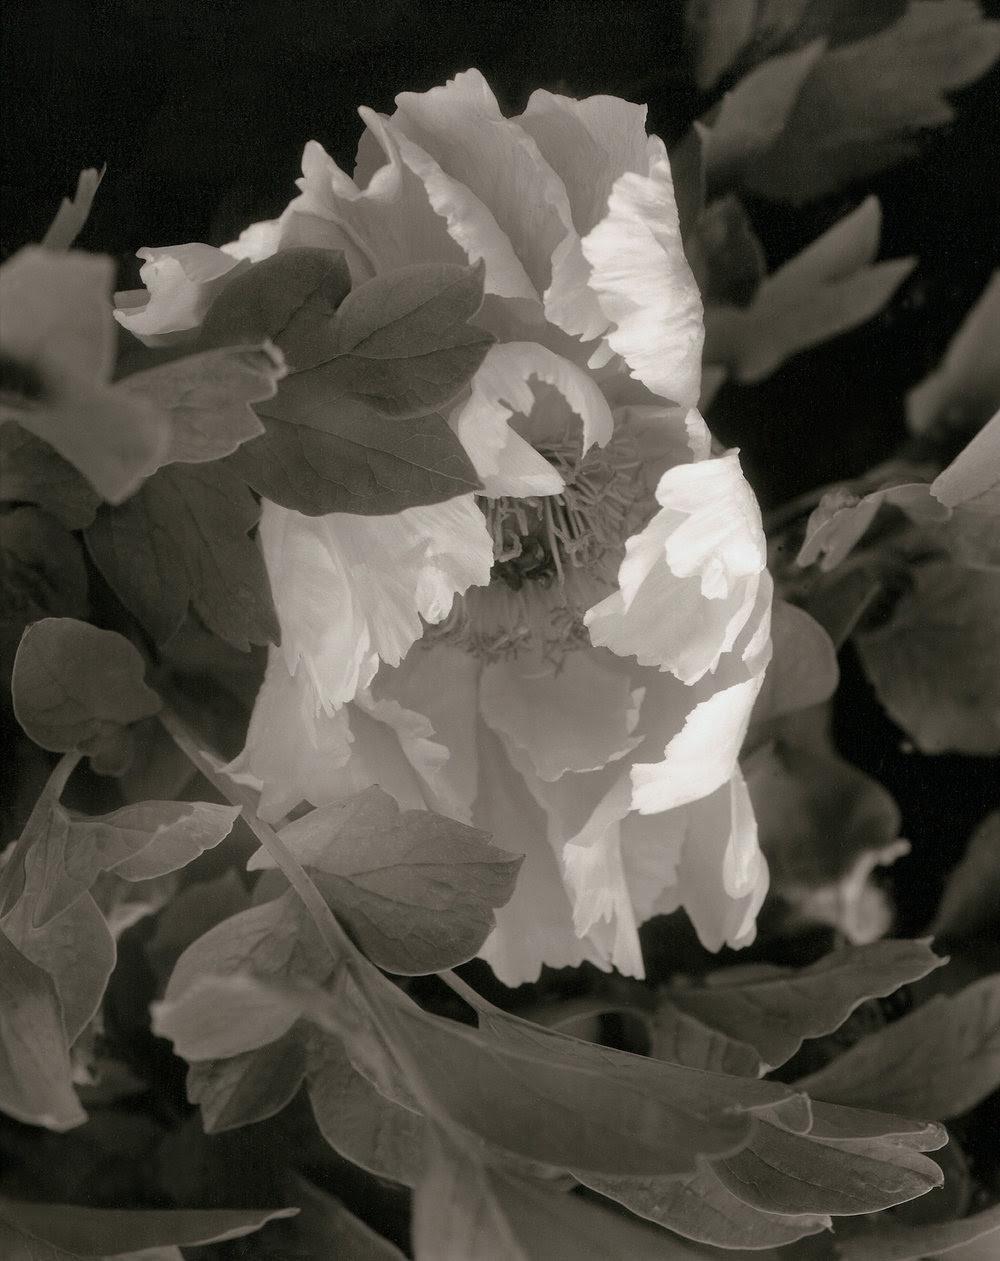 Elvira Piedra, New Flower among the Leaves,Tree Peony.jpg